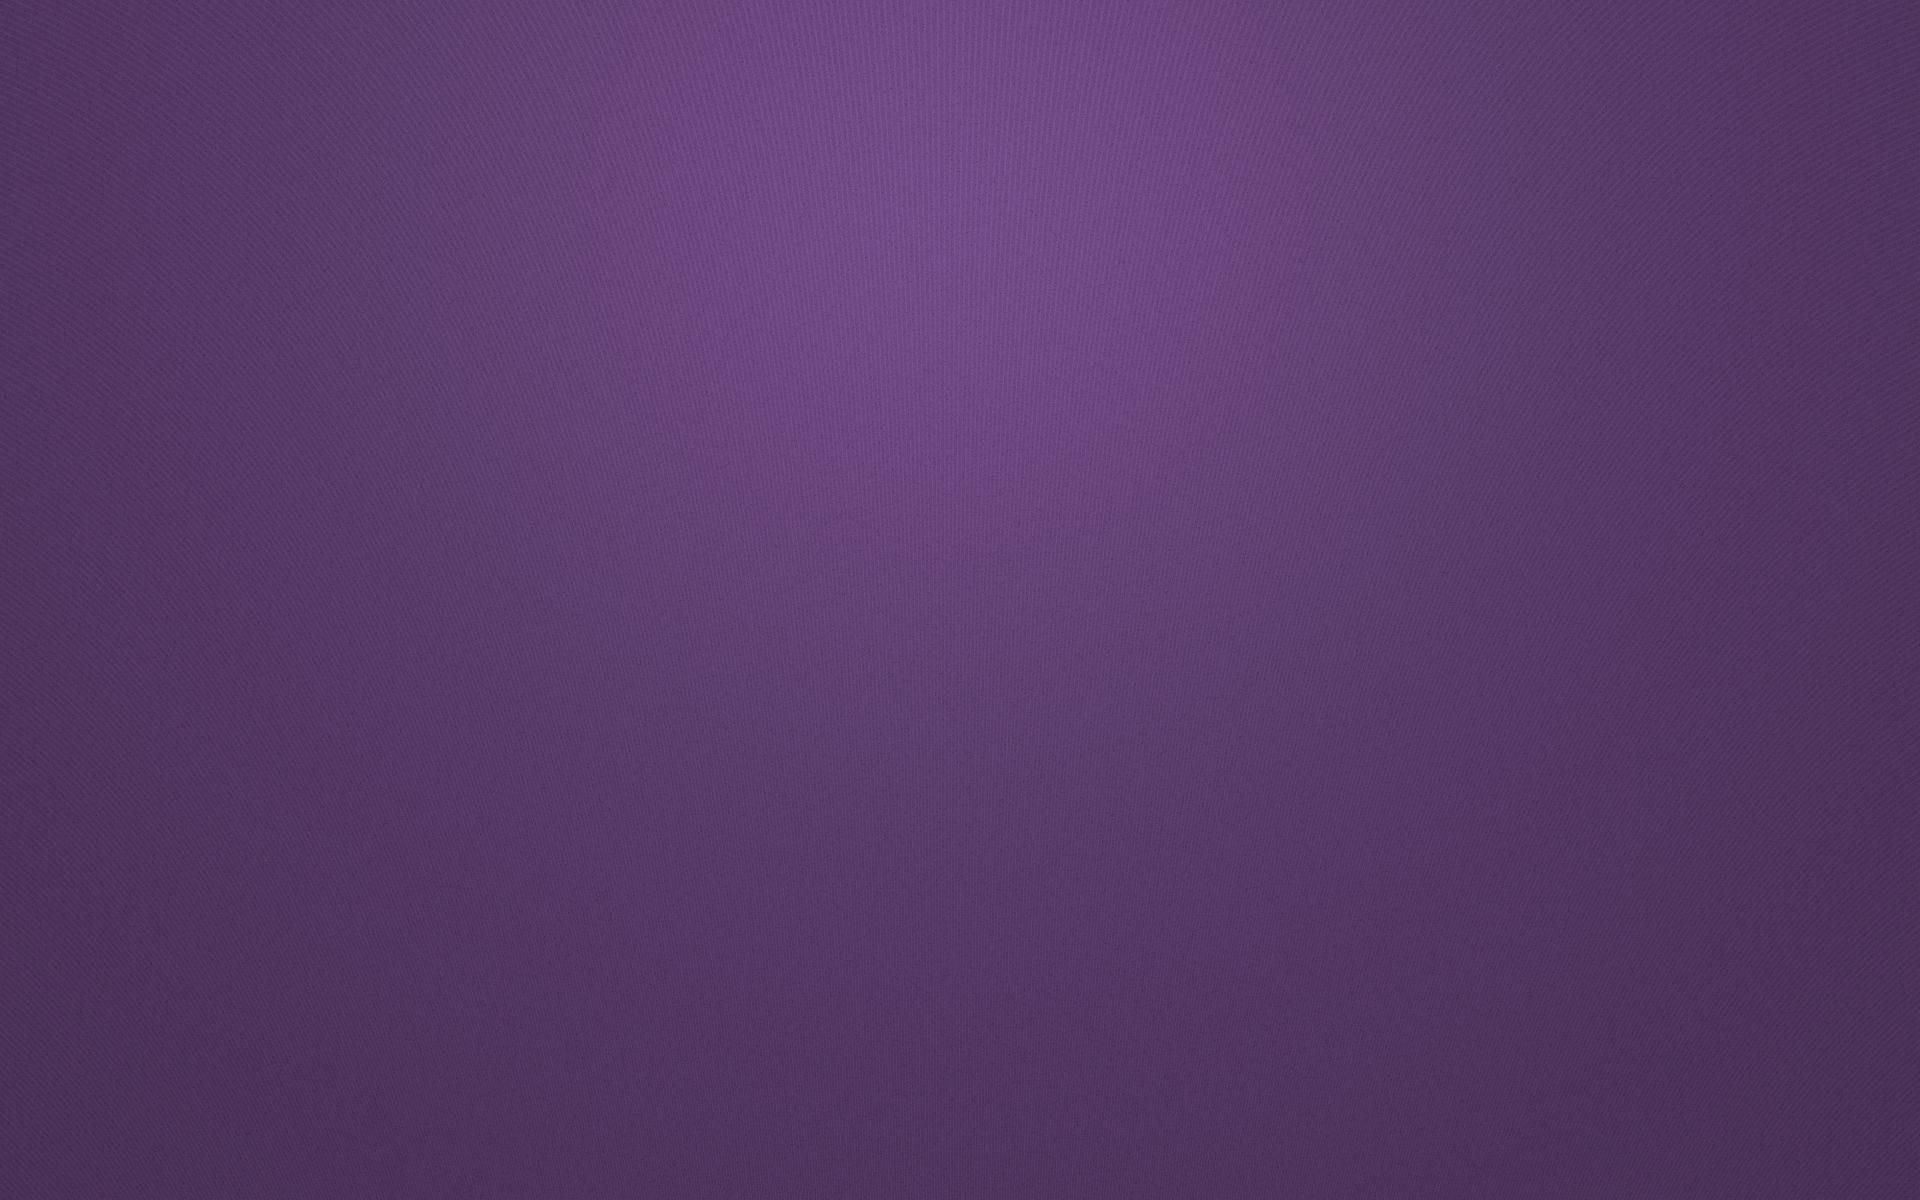 Plain Purple Wallpaper Colors Plainpurplewallpaper Wallpapers